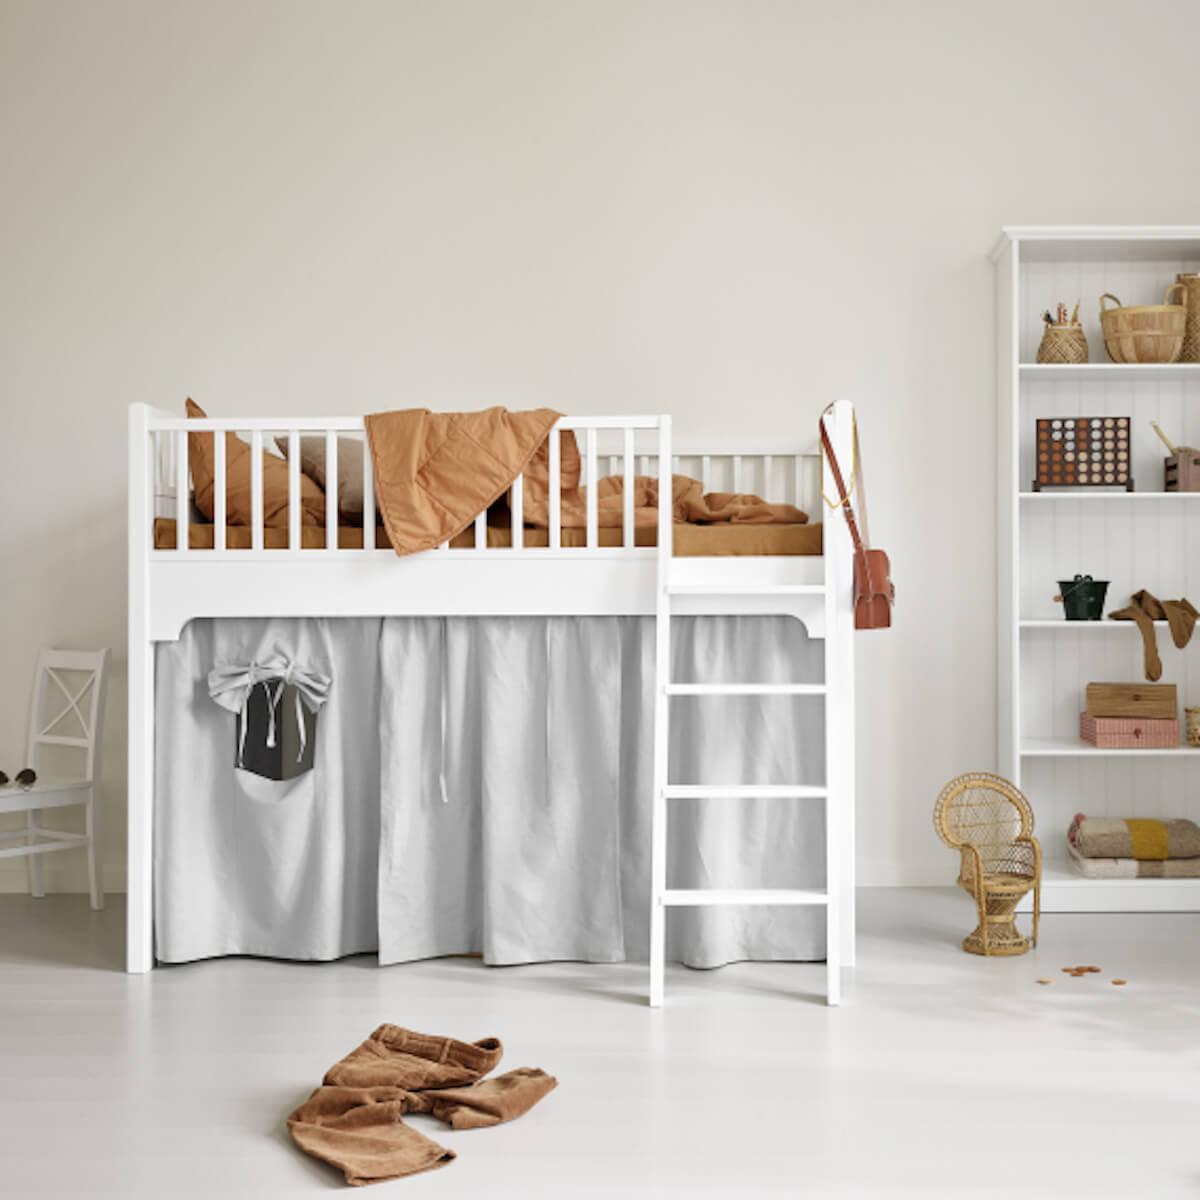 Cama media-alta 90x160cm SEASIDE CLASSIC Oliver Furniture blanco